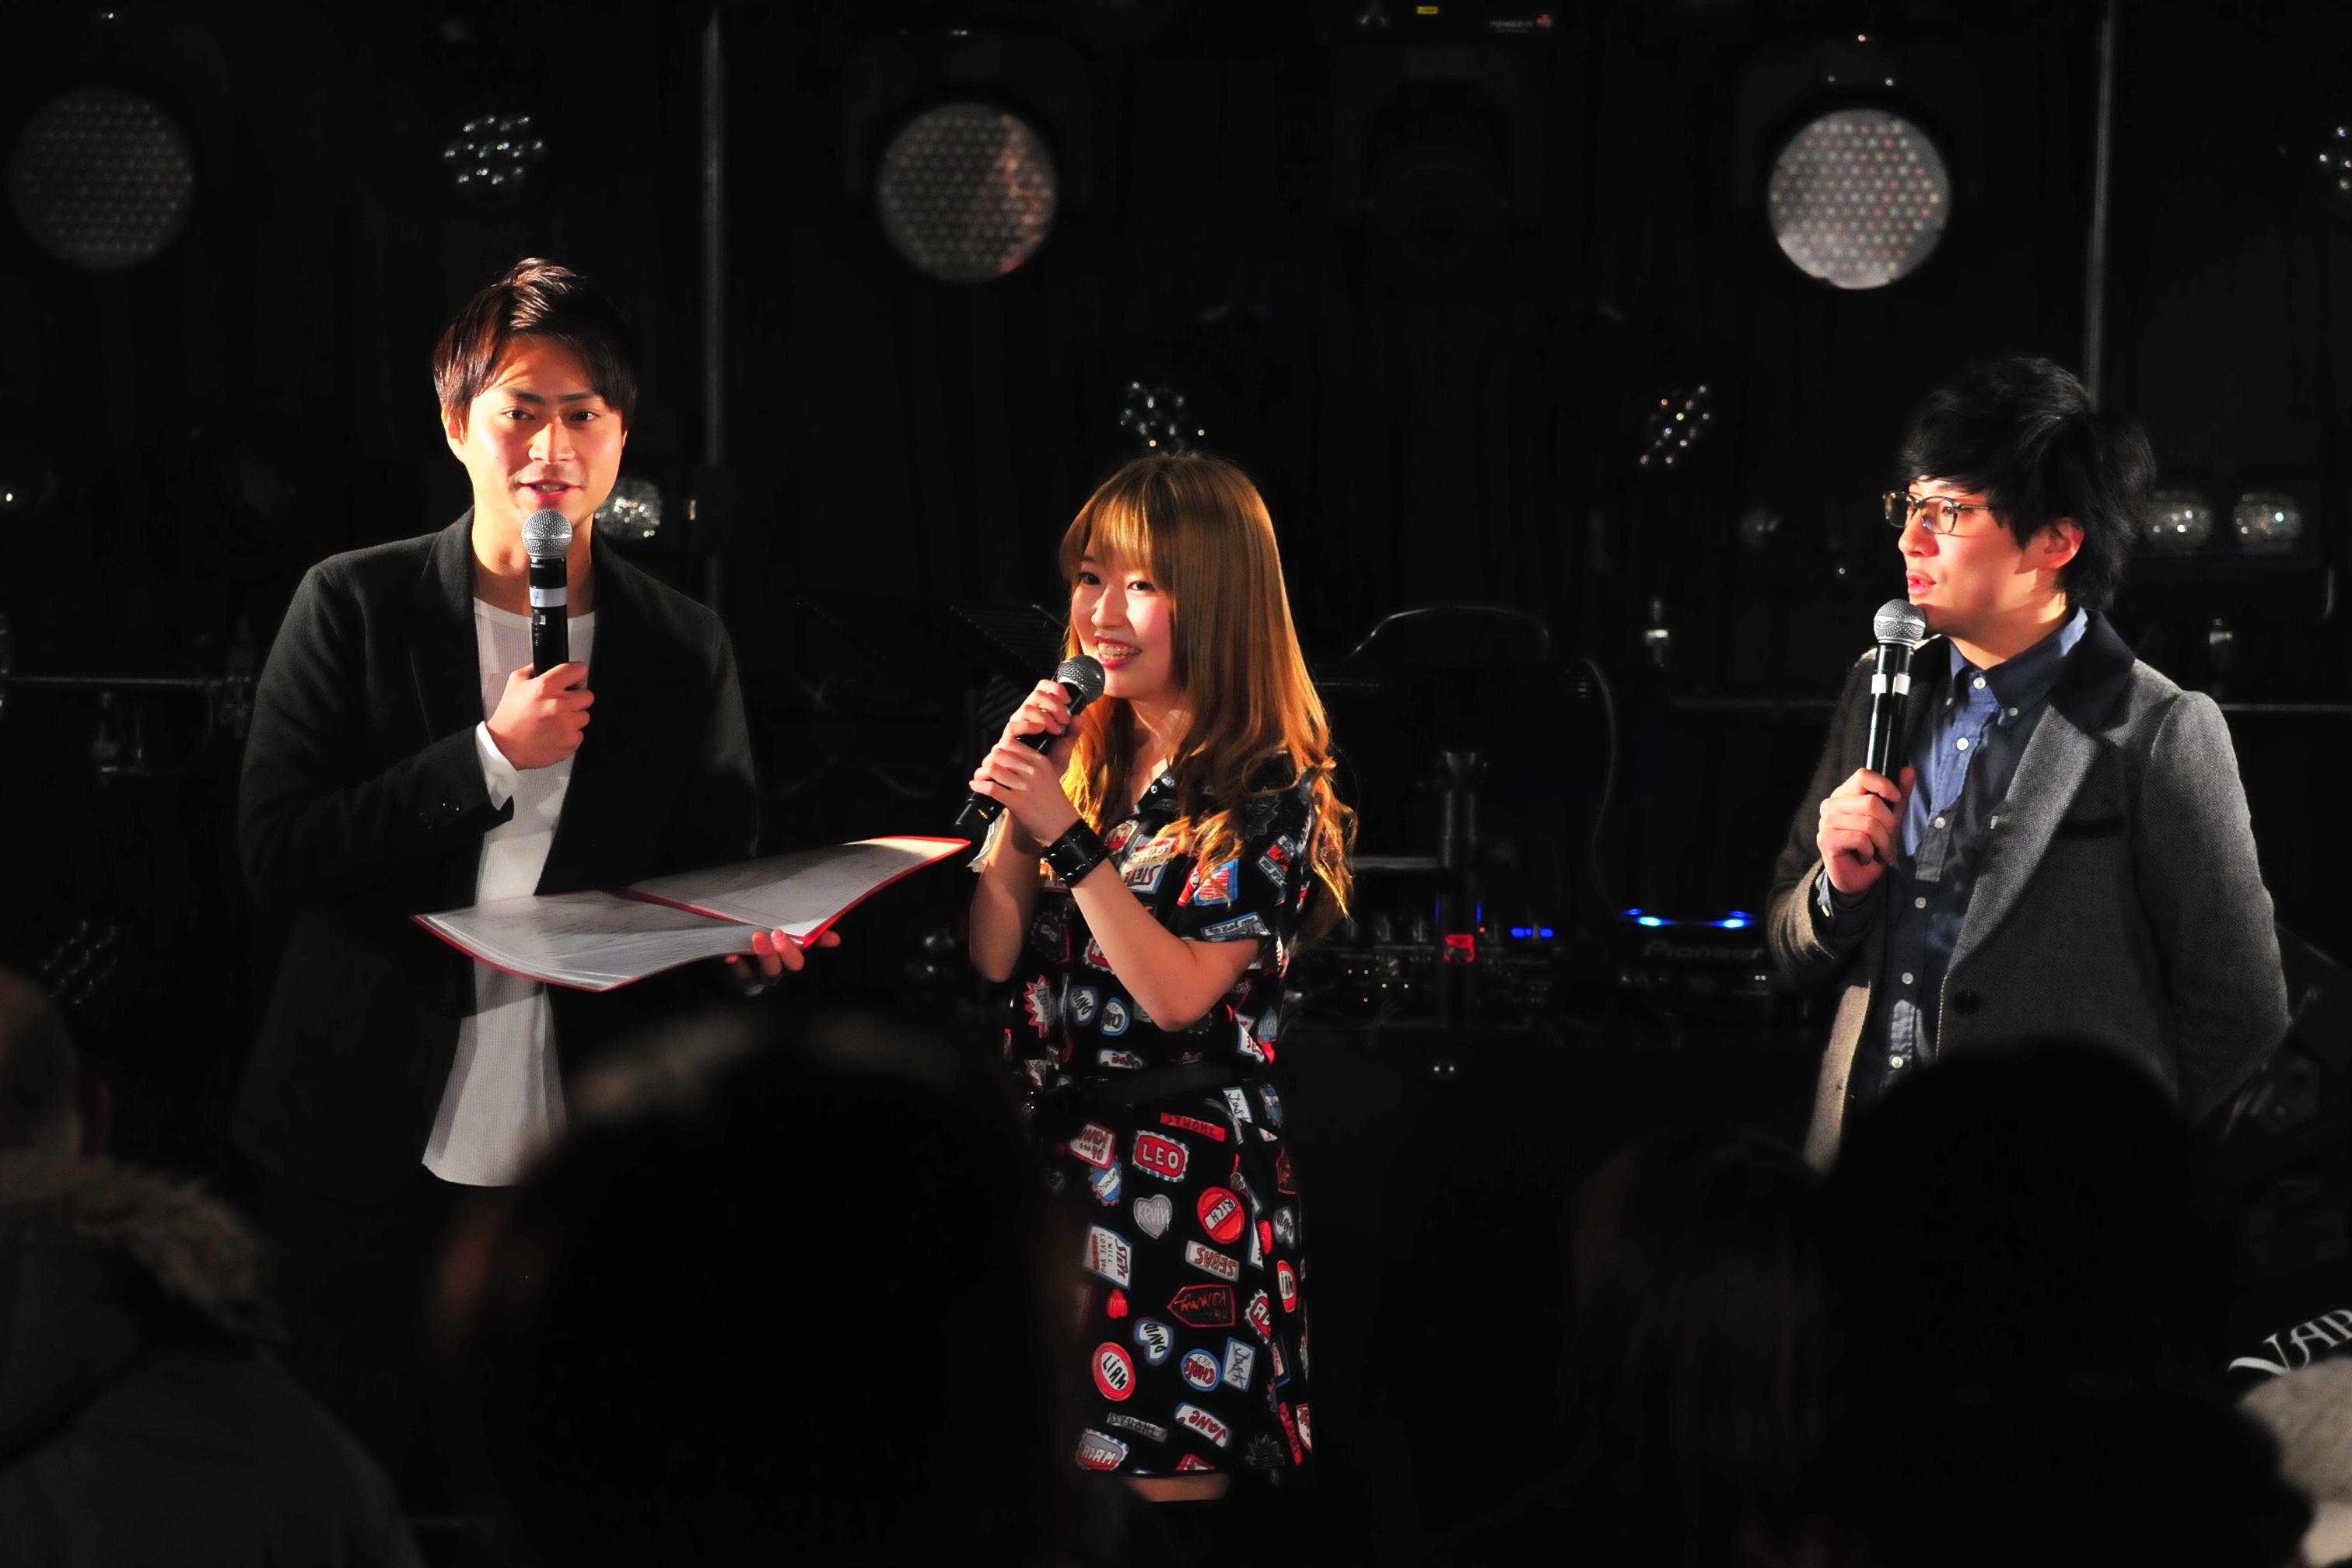 http://news.yoshimoto.co.jp/20170125191835-6f1224fda648a306819cccef4e38a3f04f281098.jpg